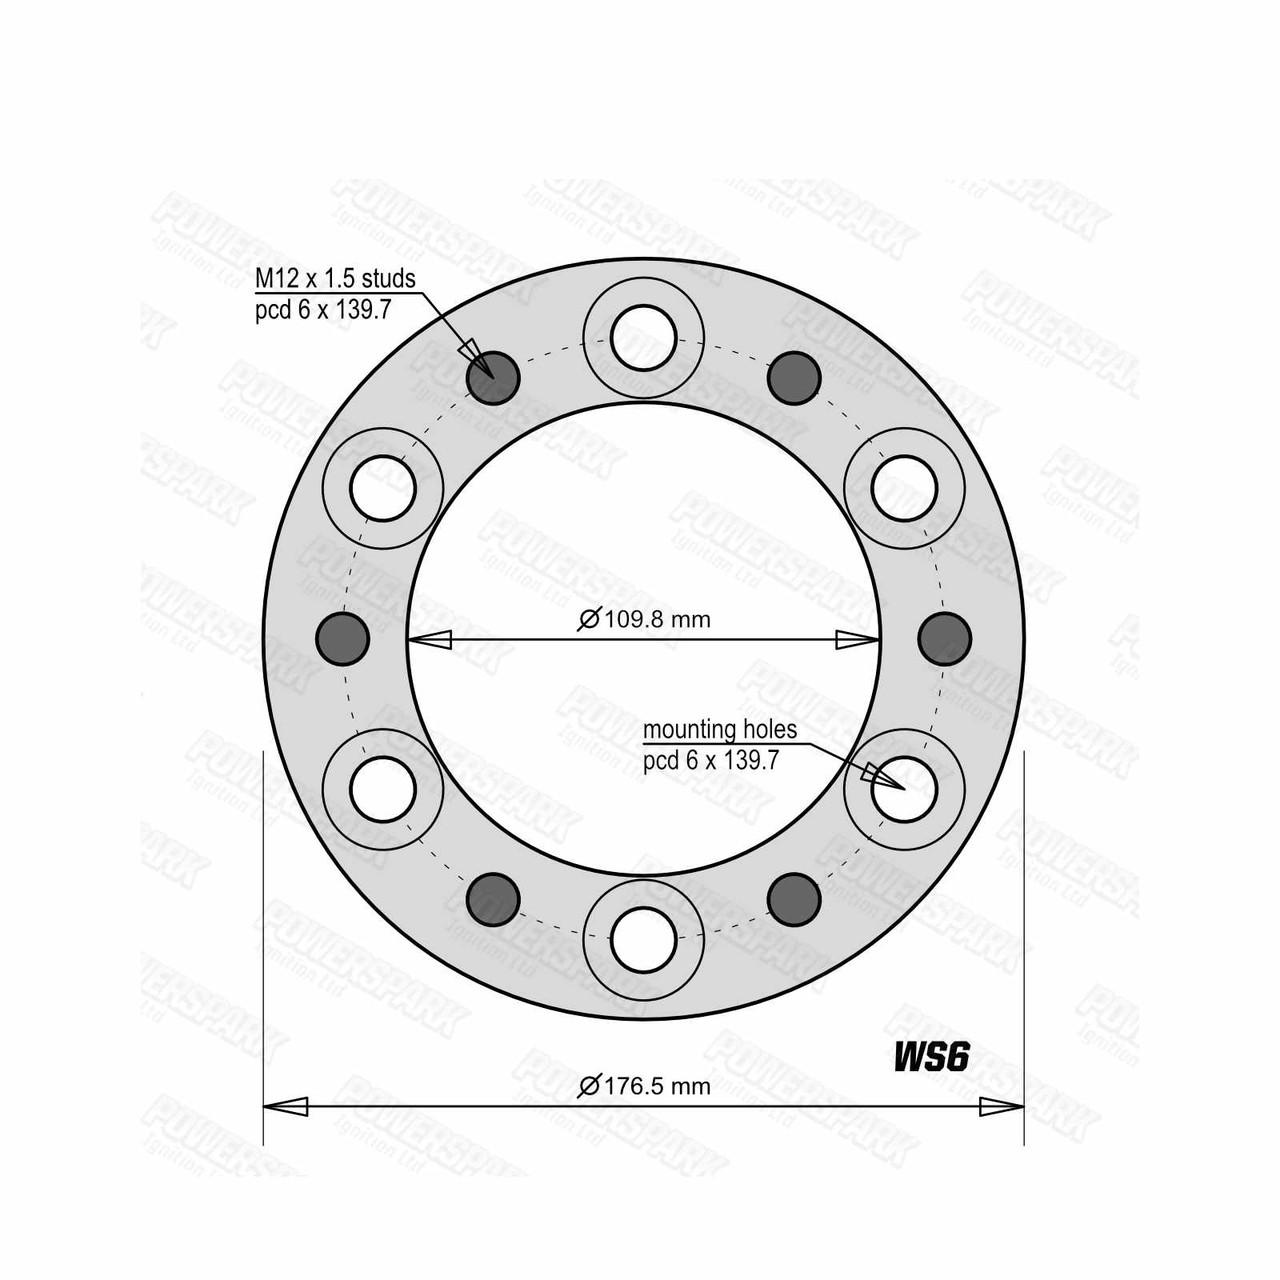 Four Bulldog 30mm Wheel Spacers To Fit 6 Stud Toyota, Mitsubishi, Isuzu, Ford, Vauxhall 4x4 Vehicles